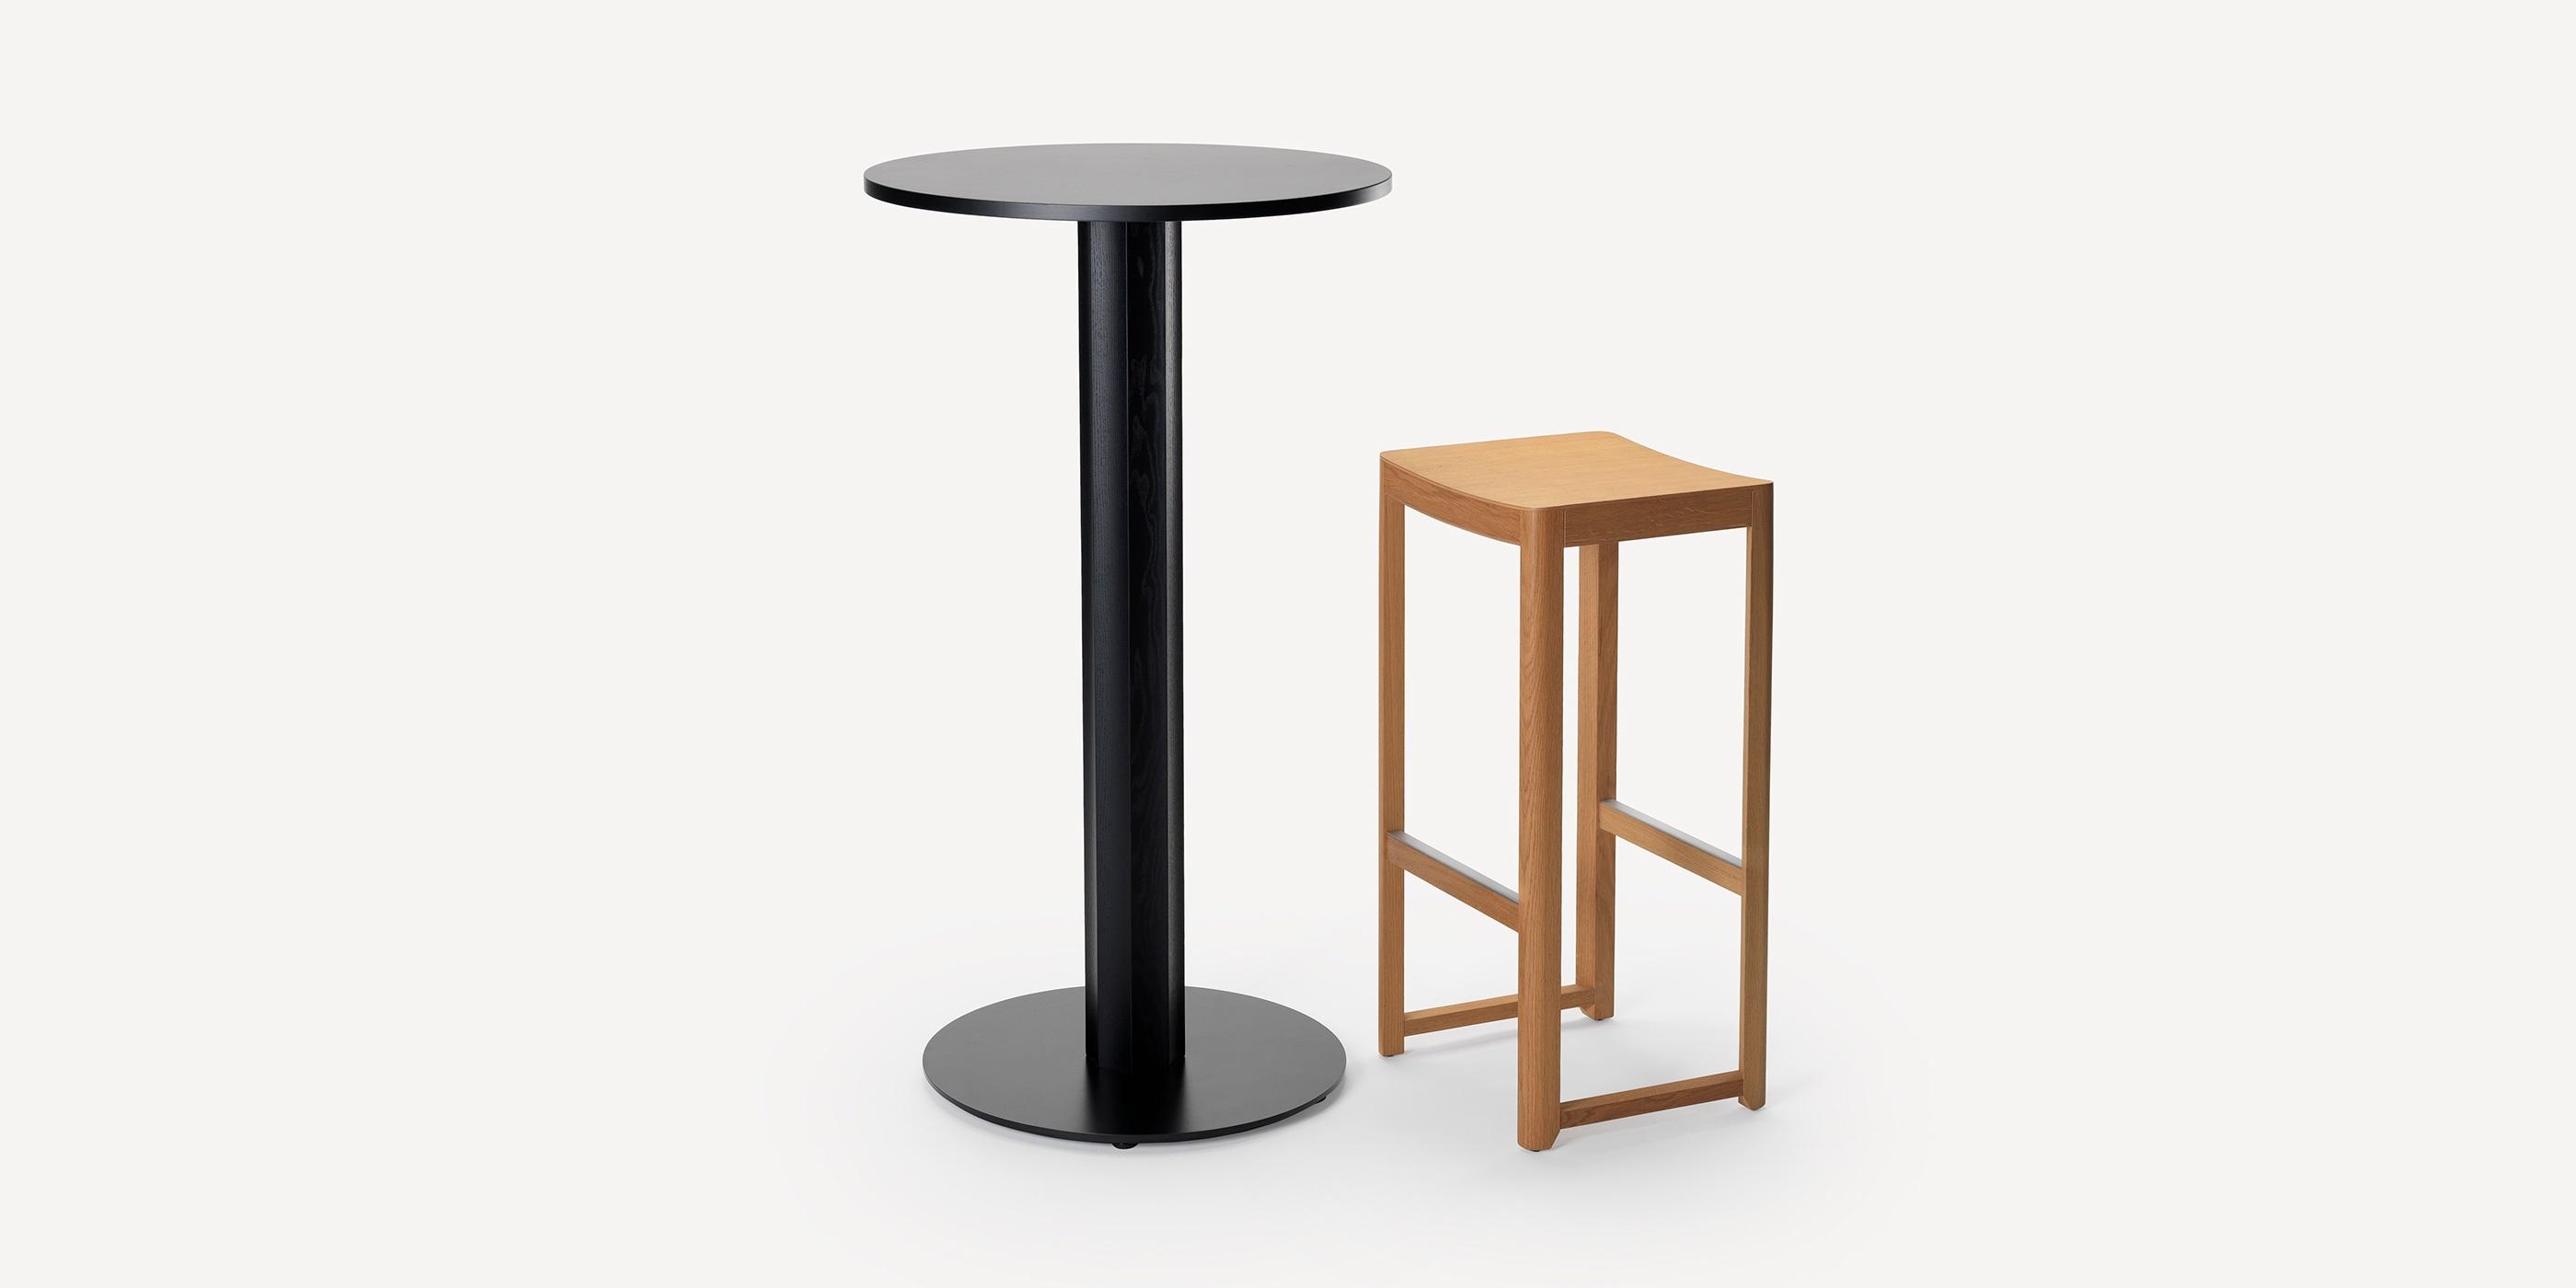 With Seleri bar stool